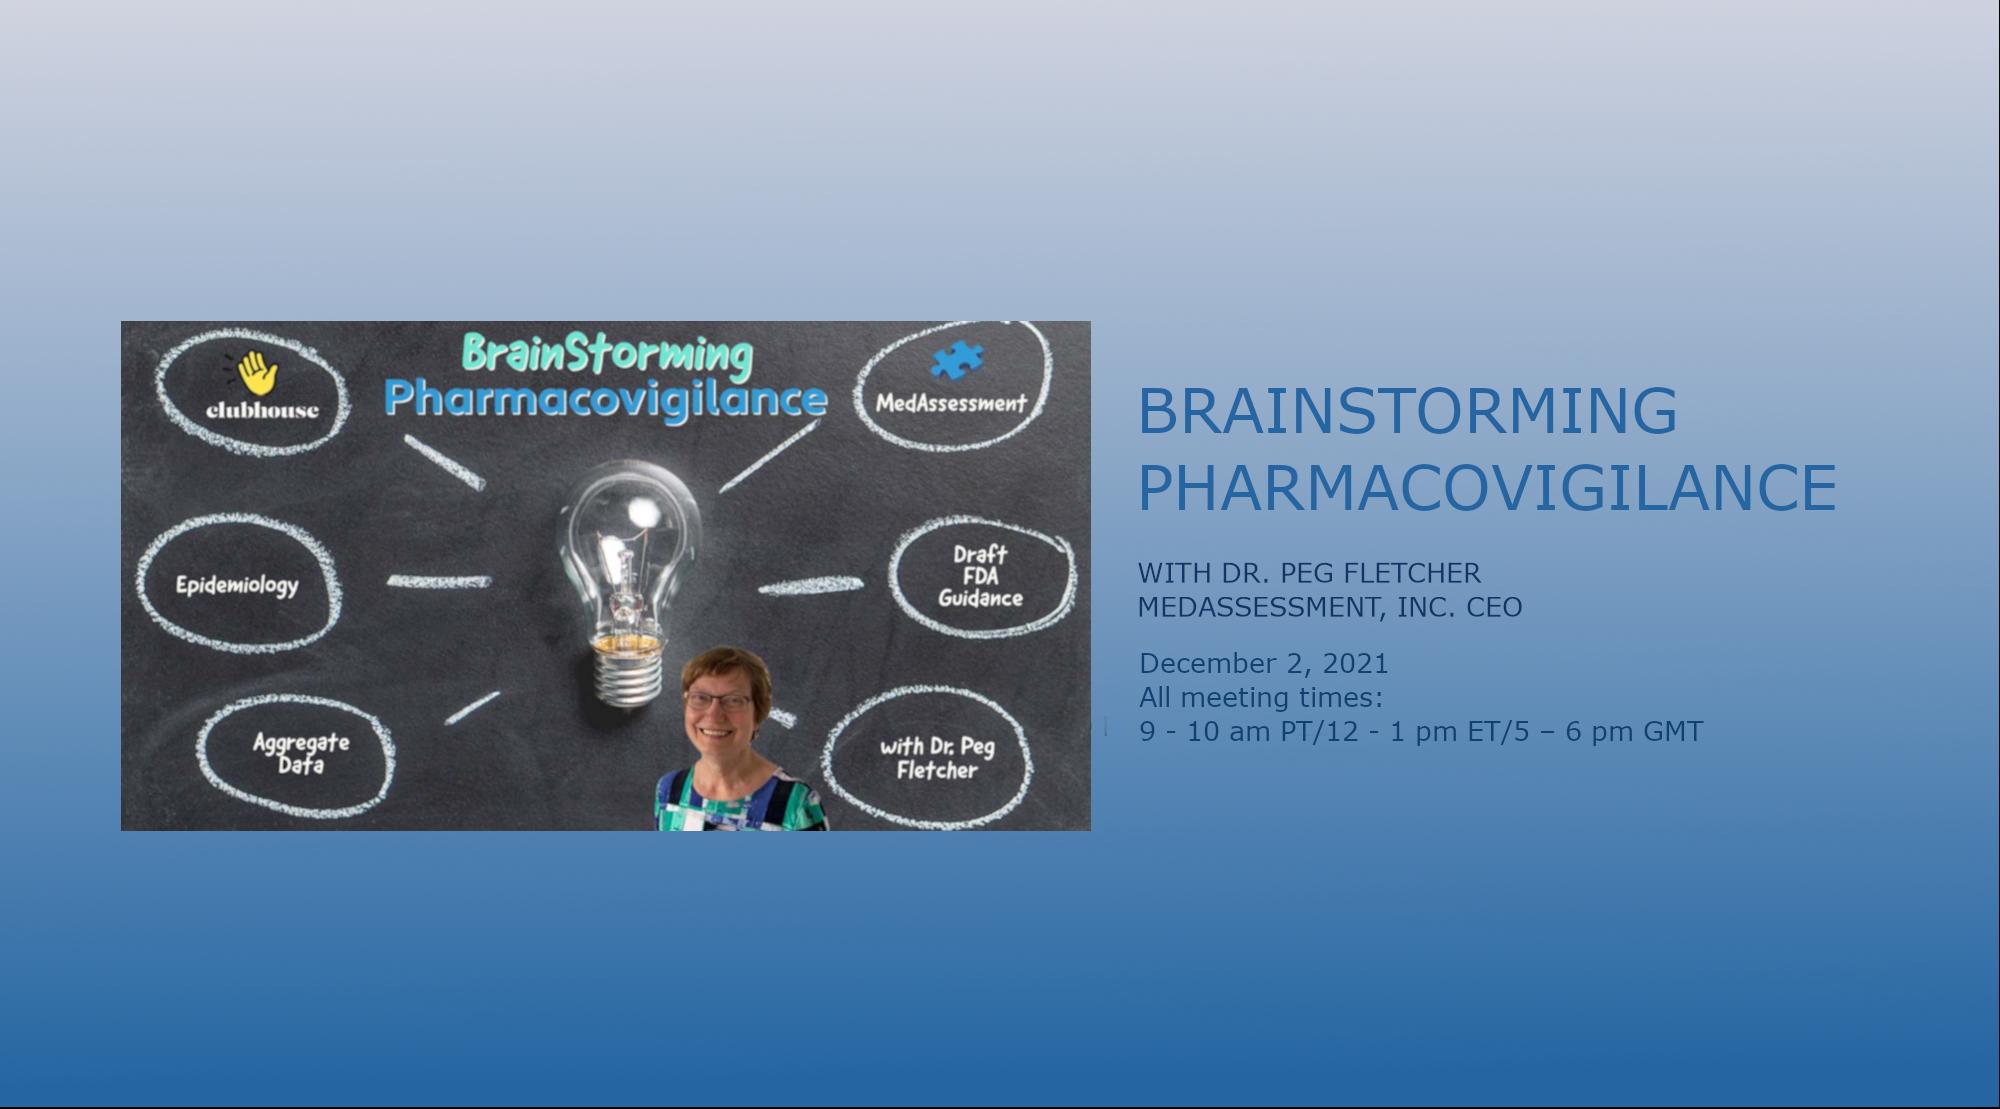 Brainstorming Pharmacovigilance